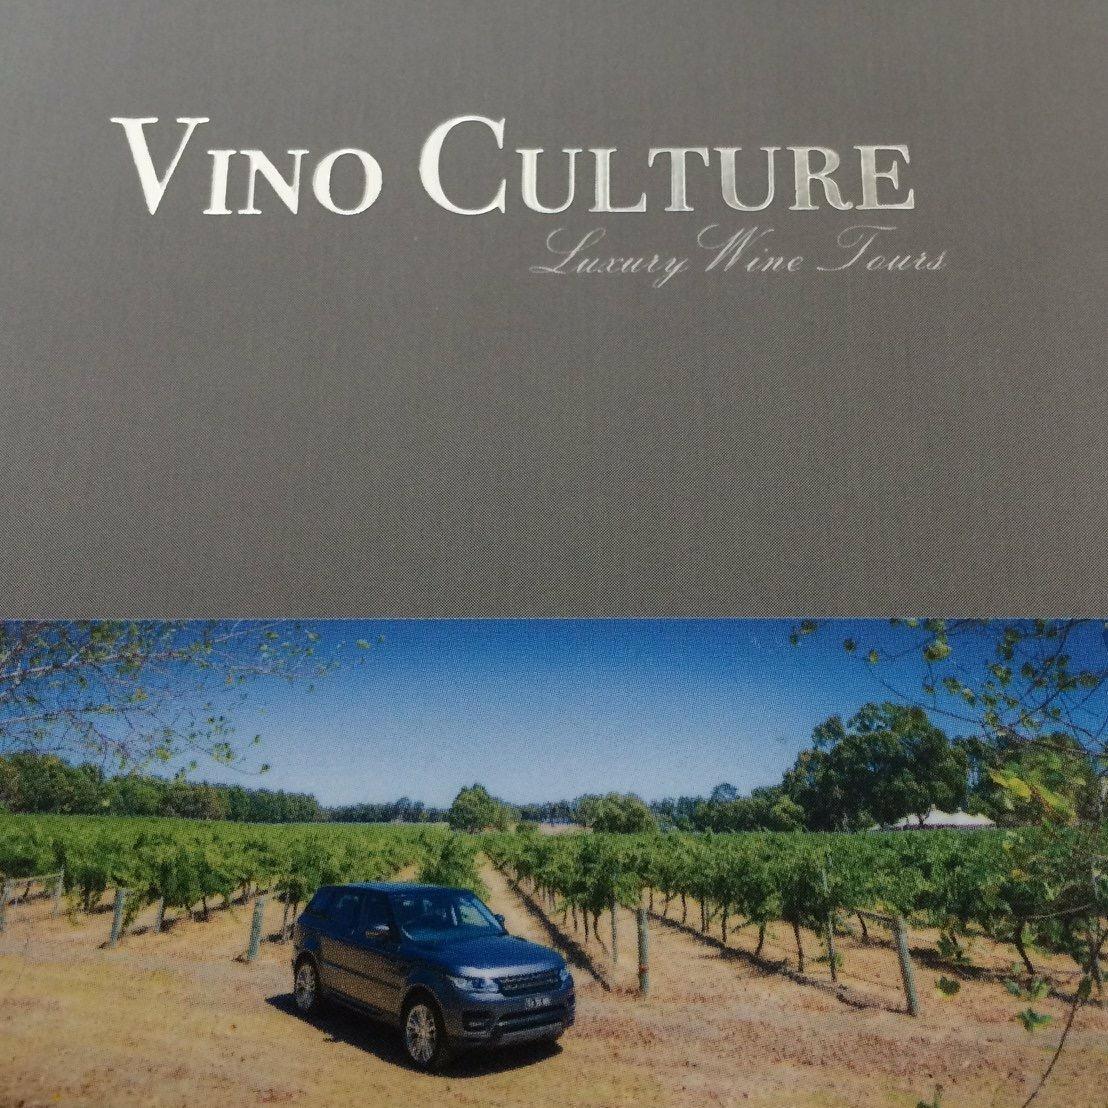 vinoculture 1.JPG